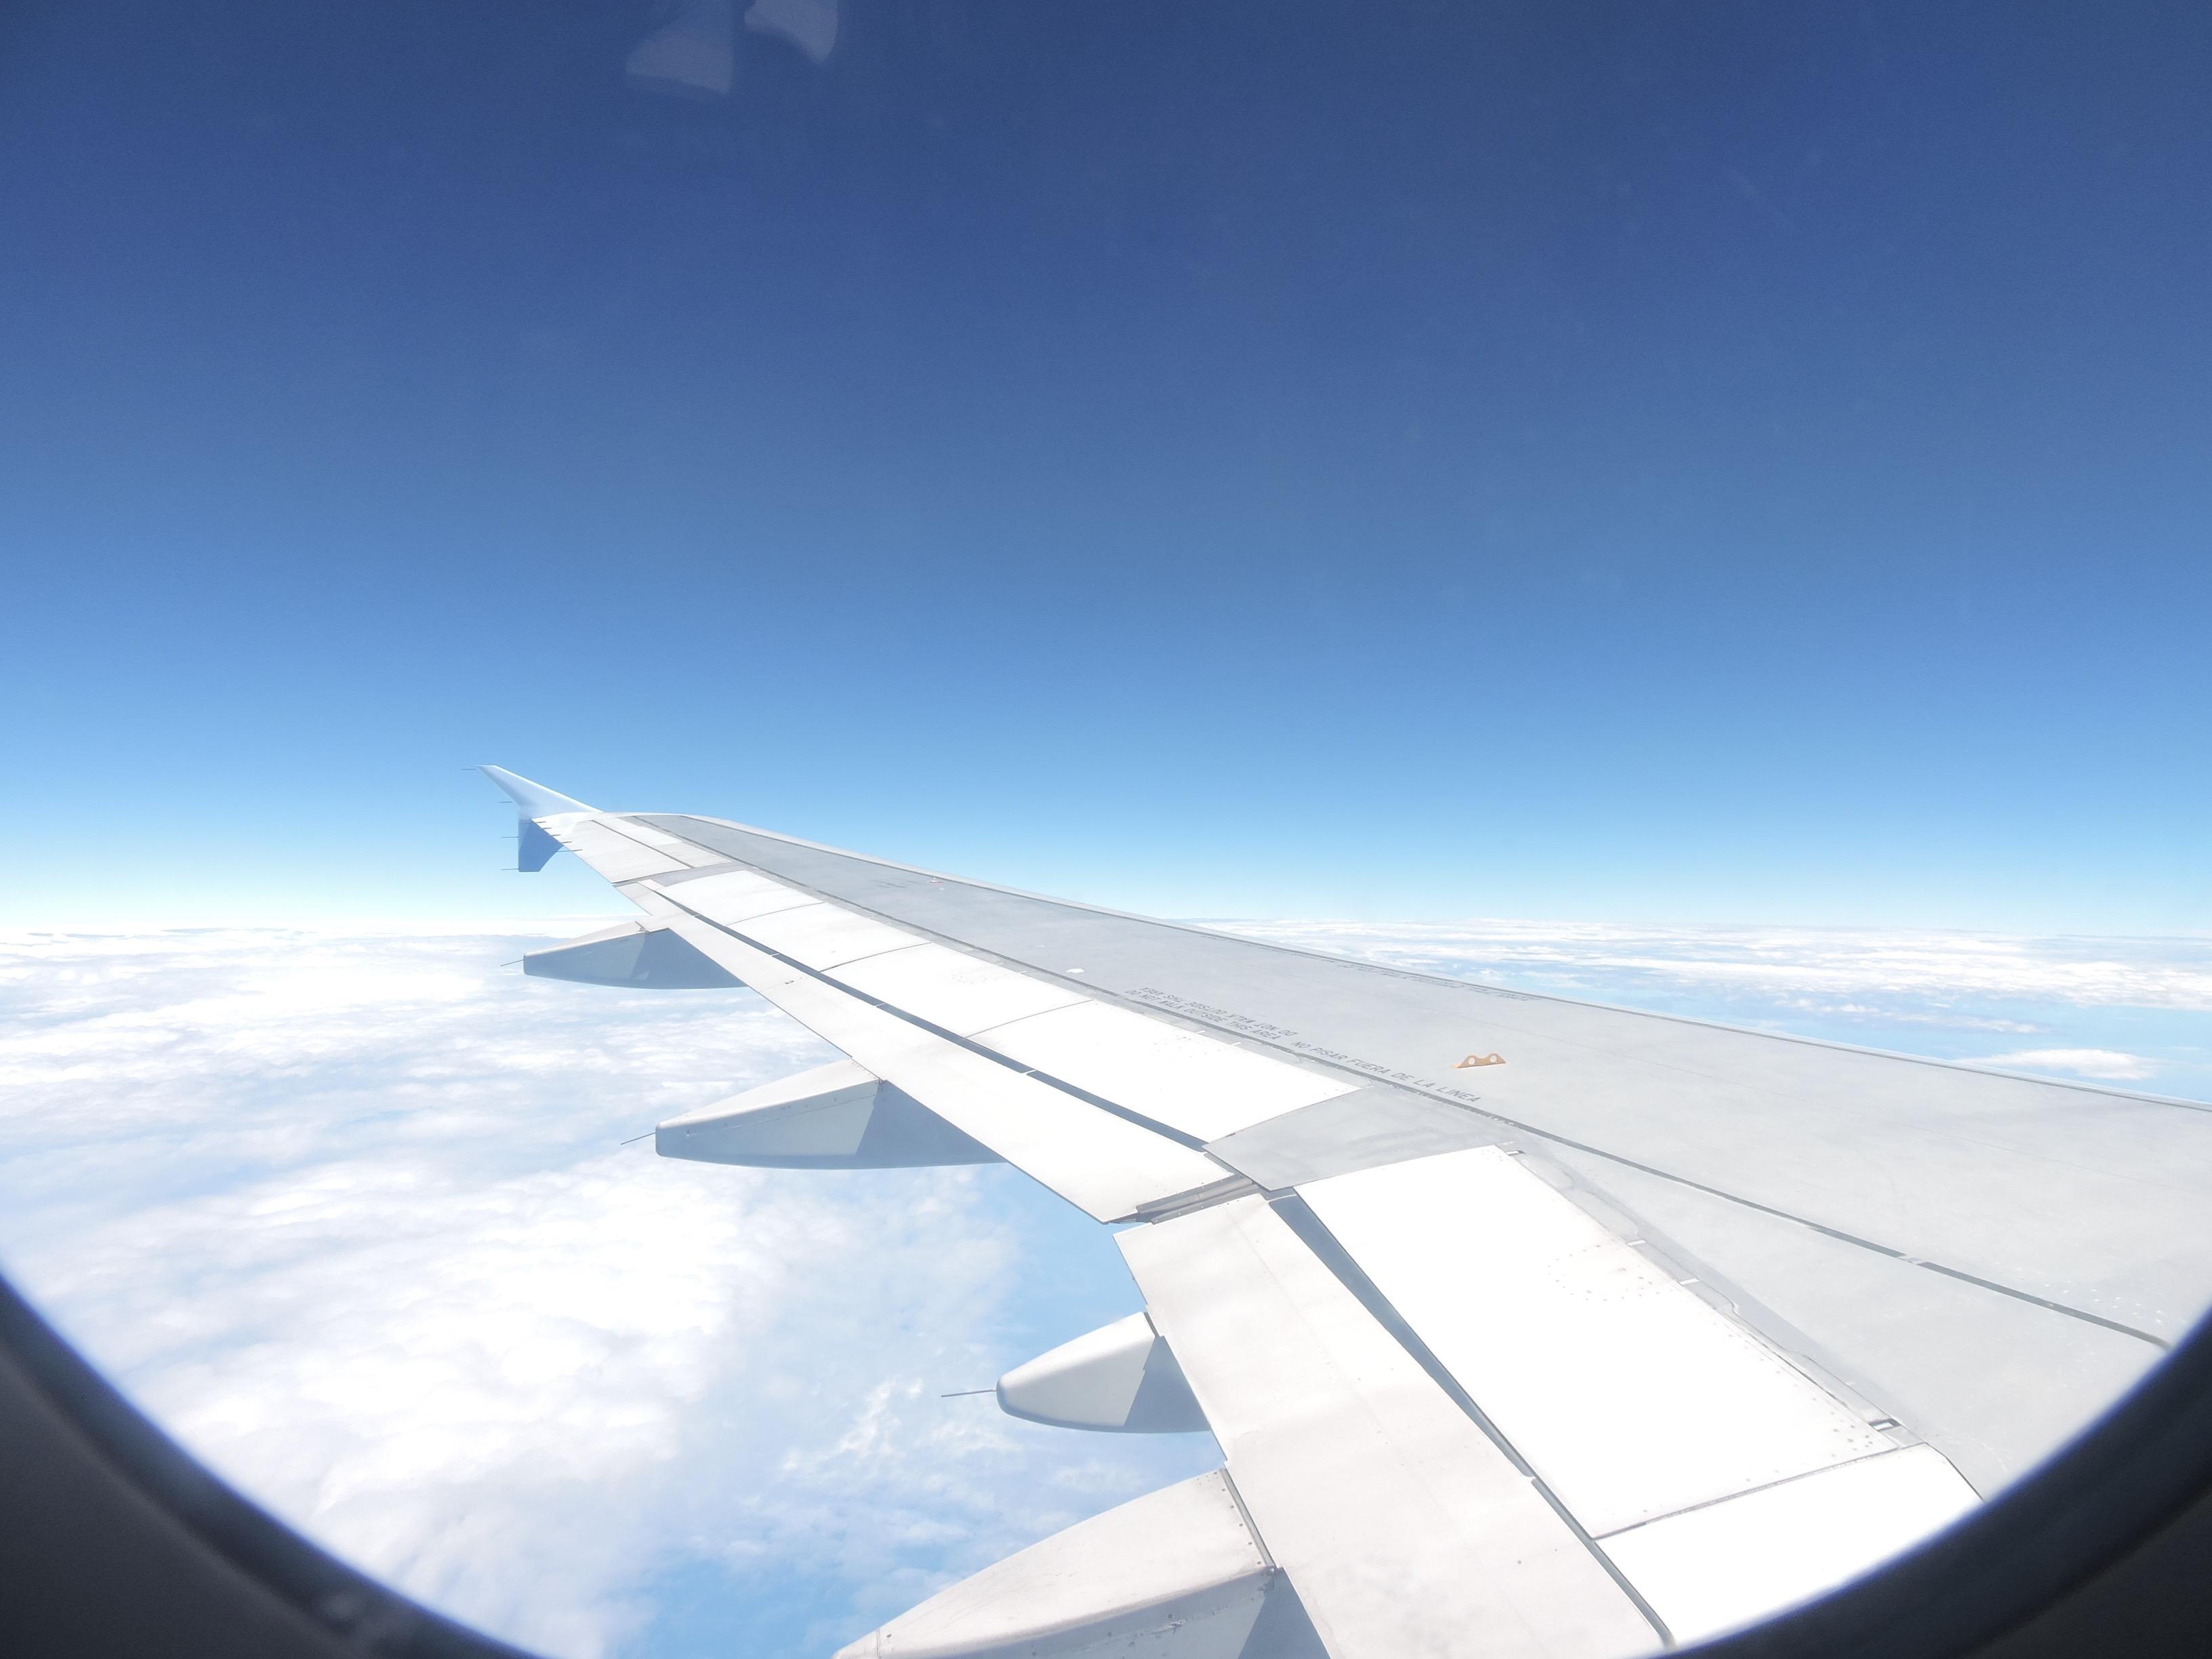 avion-viceversasemueve